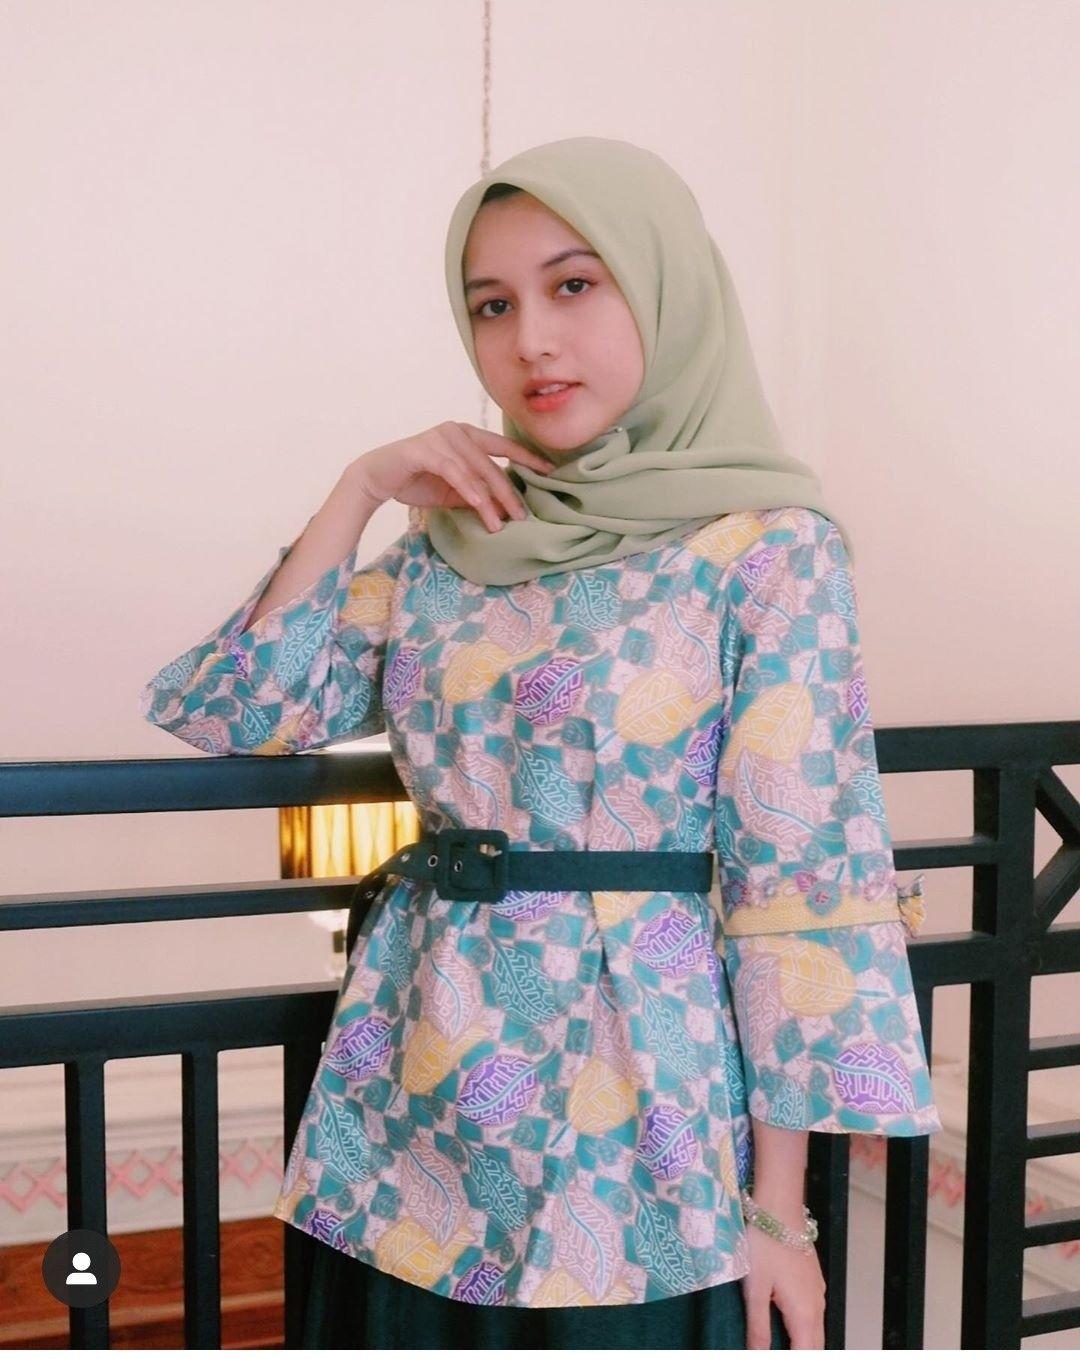 Pin Di Cute Hijaber Live chat room girls